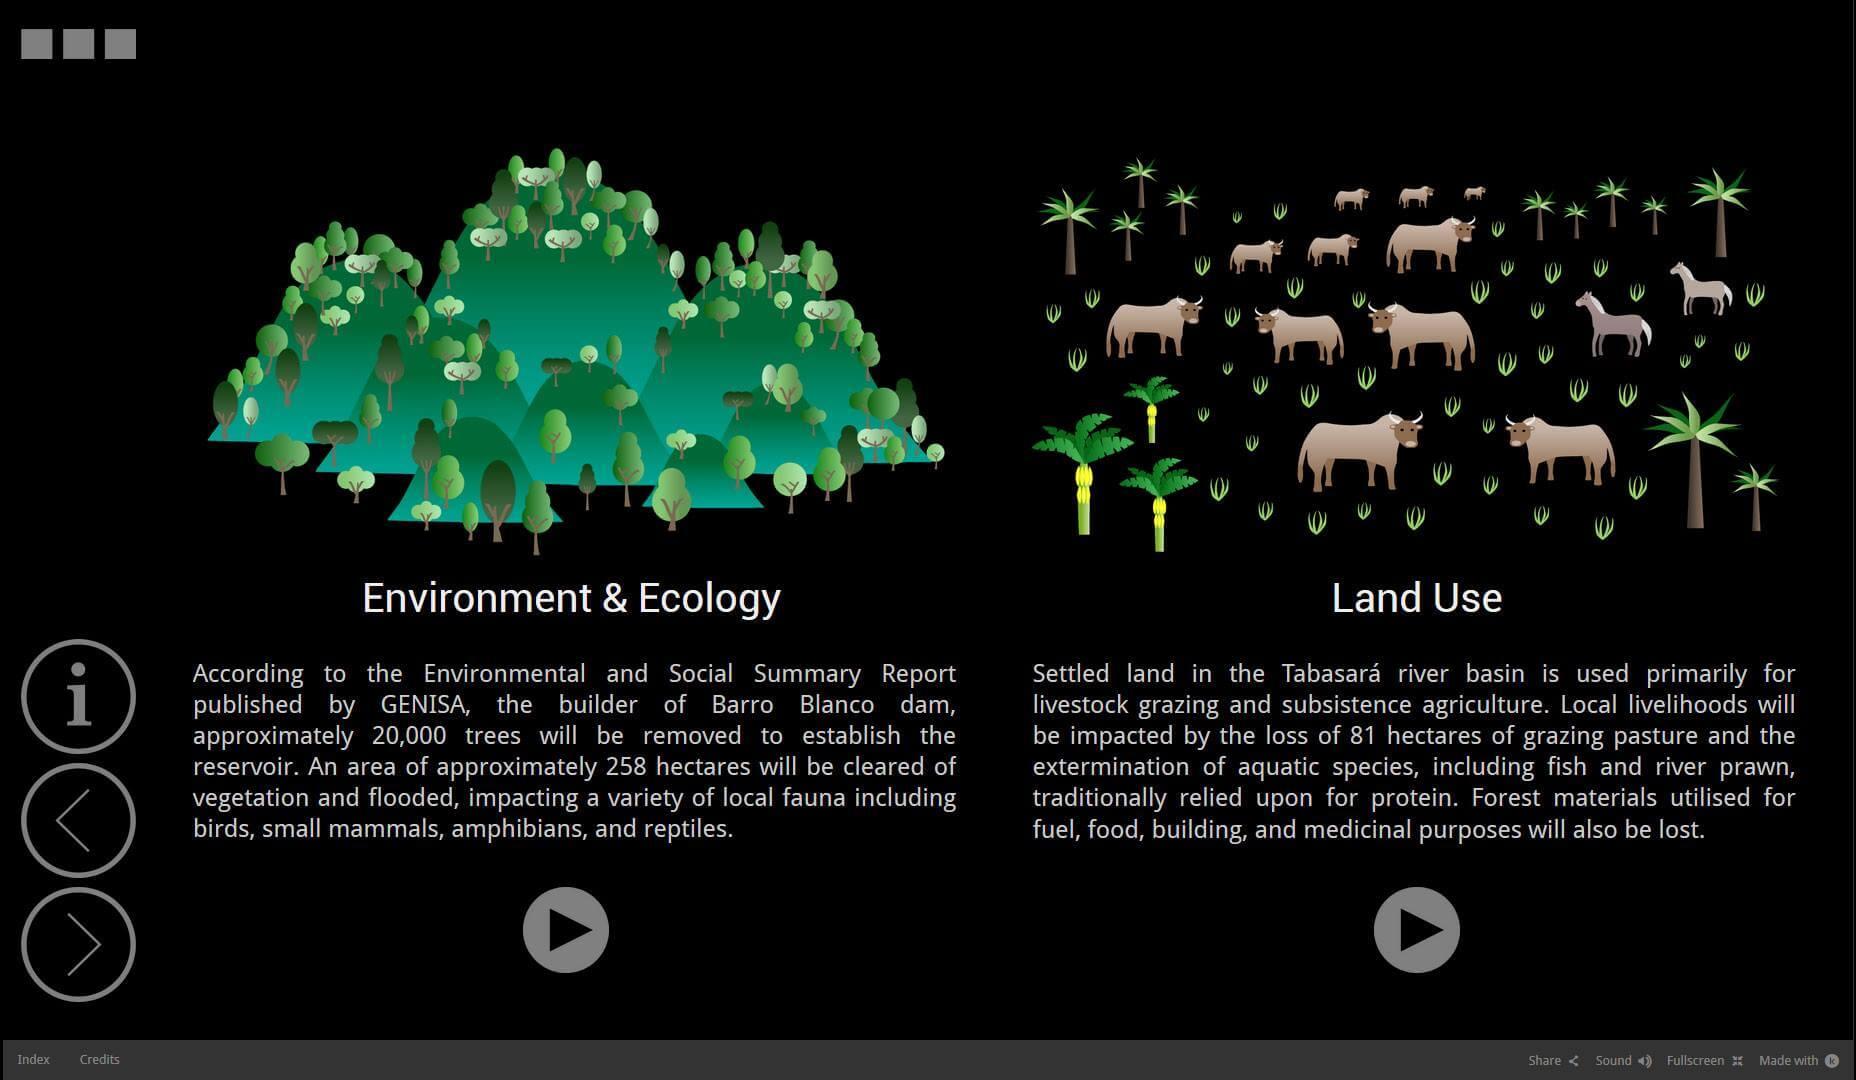 Screenshot from an experimental webdoc by Richard Arghiris